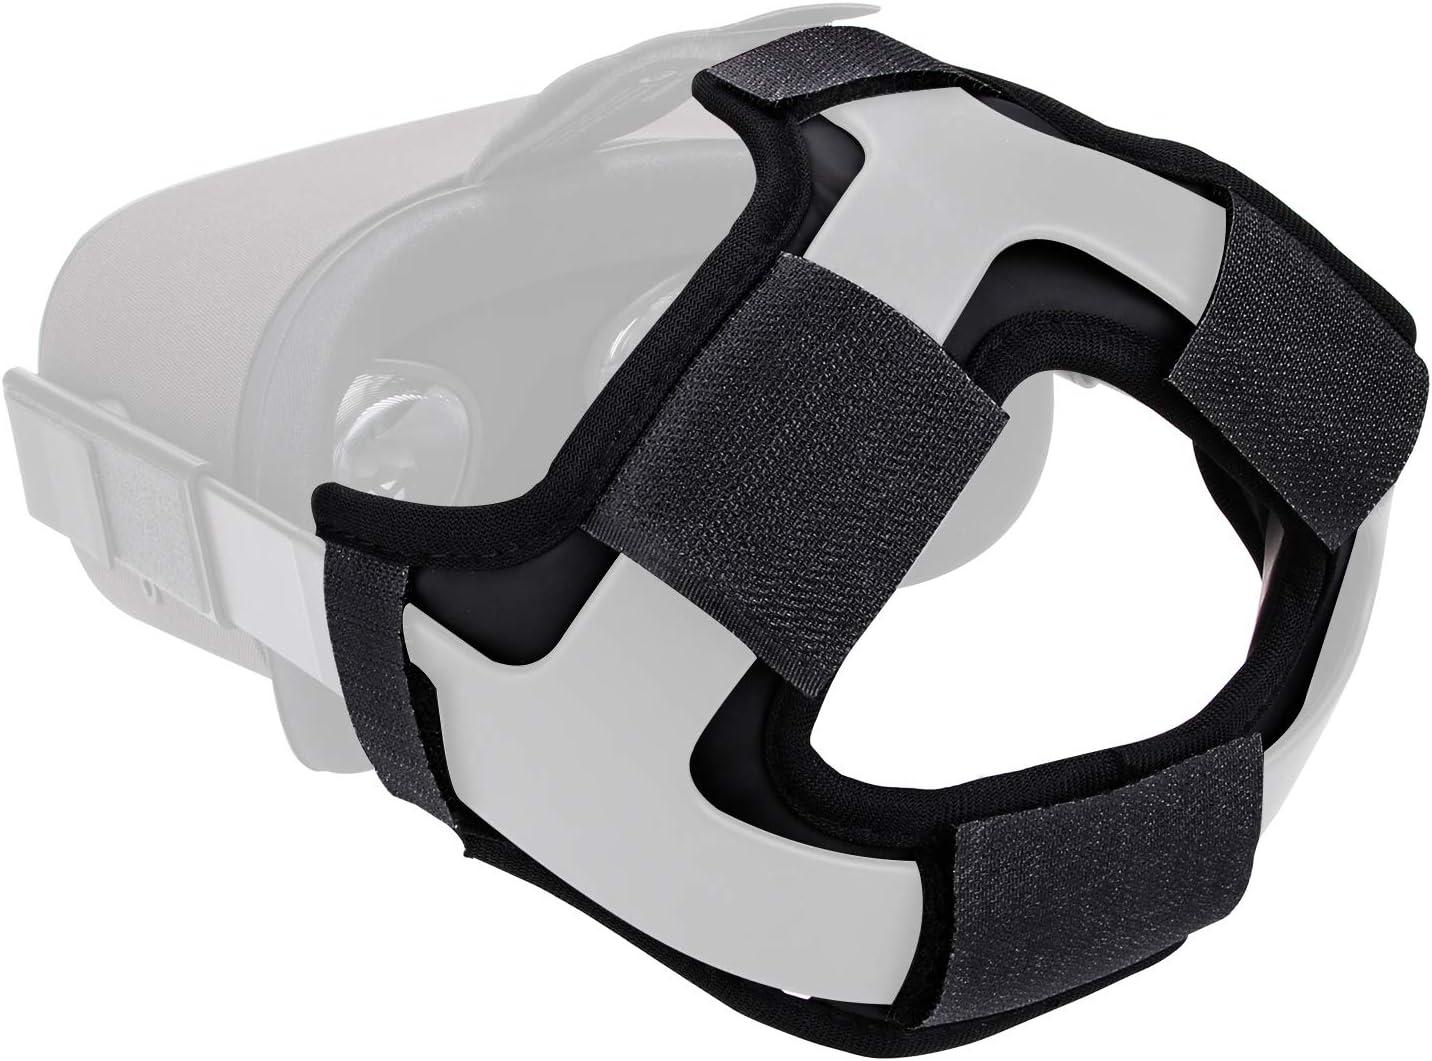 Head Strap Foam Pad for Oculus Quest - by X-super Home 2020 Pro Version VR Cover Acessories More Thick & Soft Headband Reduce Head Pressure (Black, Head Strap Pad)